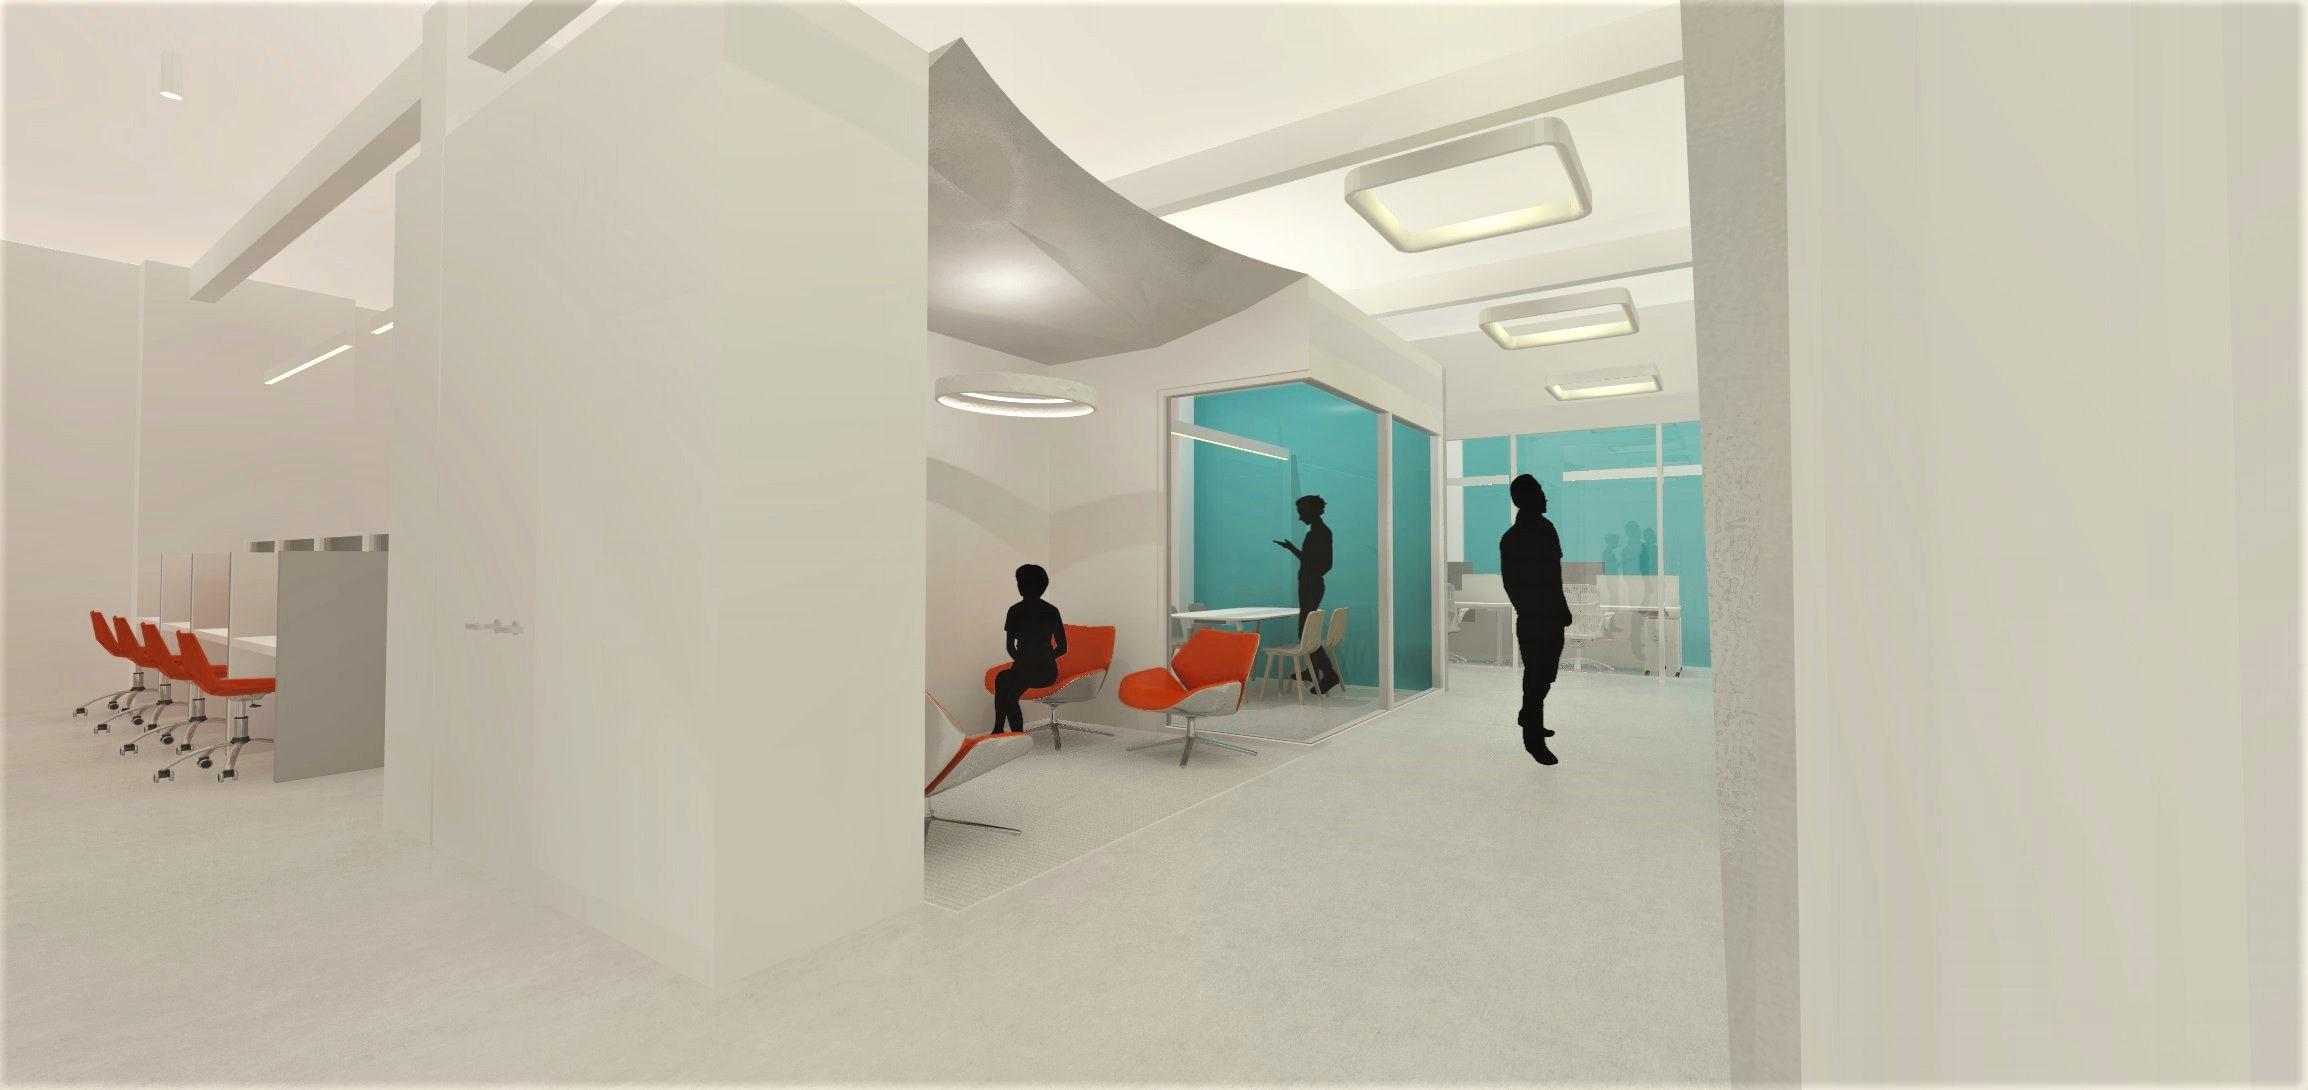 Office Interior - L.I.C